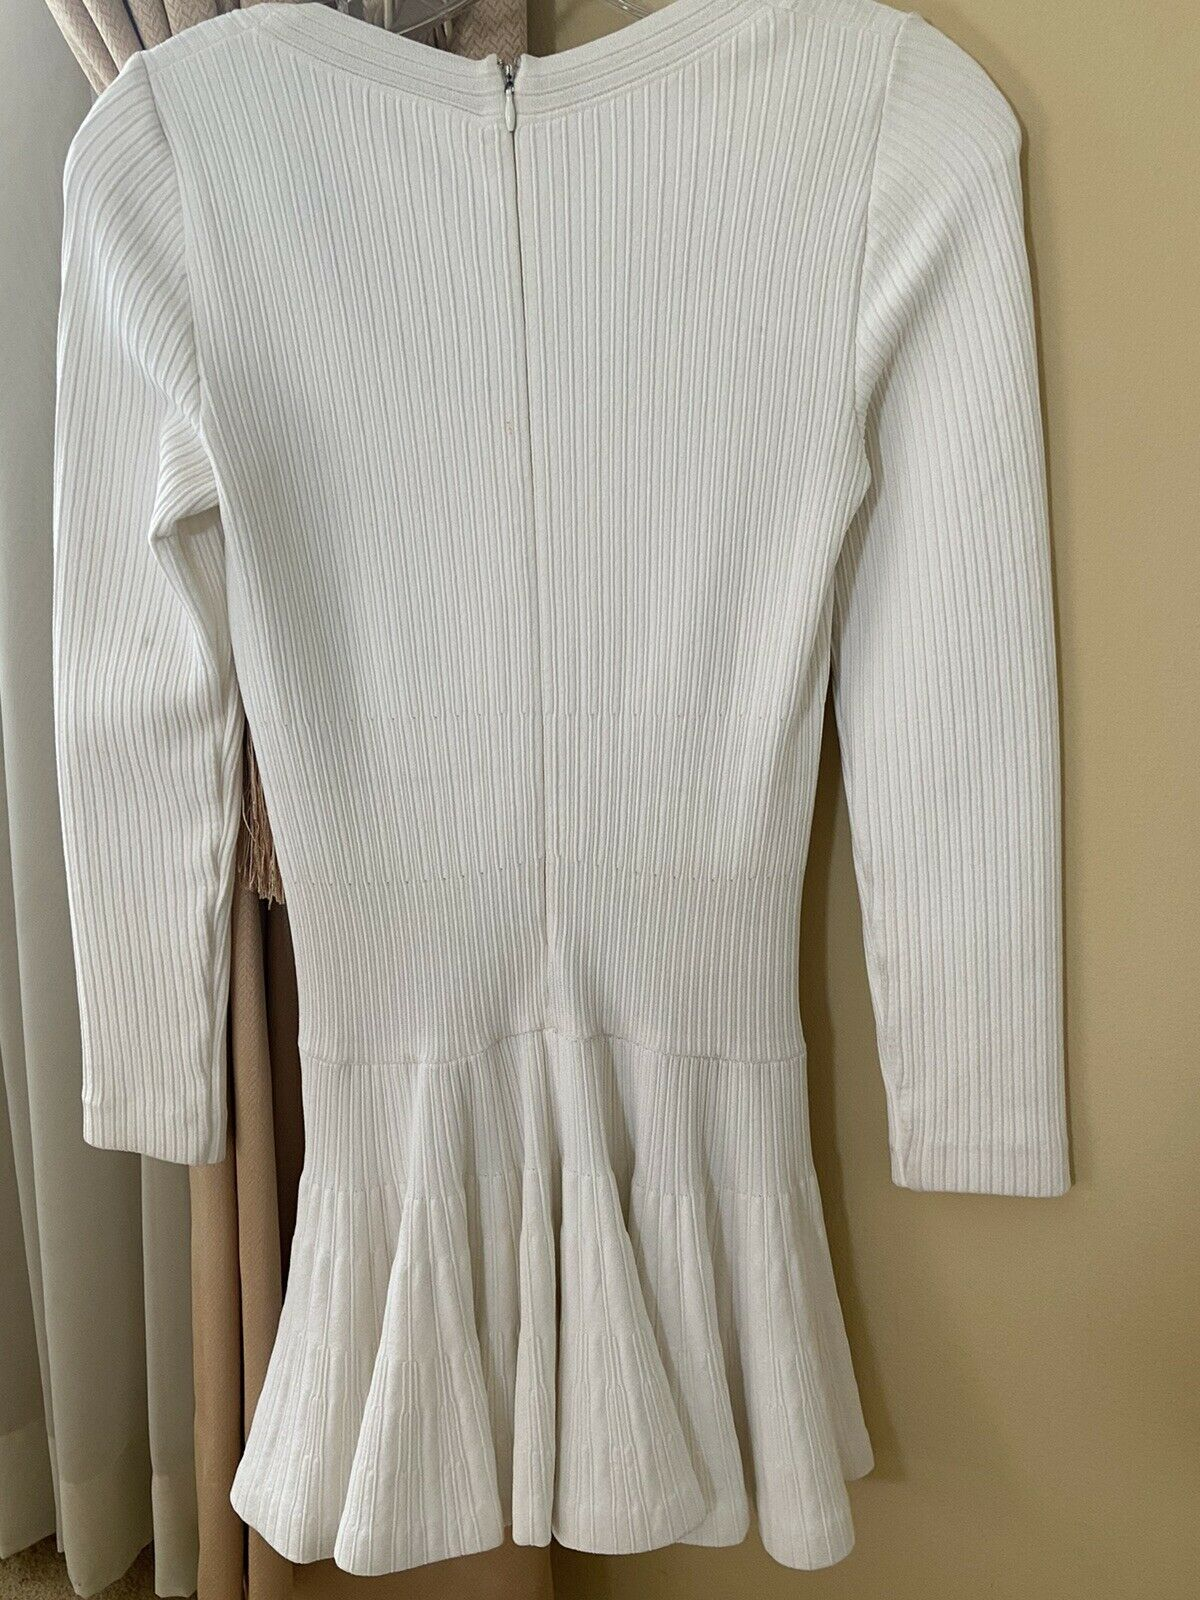 Azzedine Alaia White Long Sleeve Top Blouse Dress… - image 4